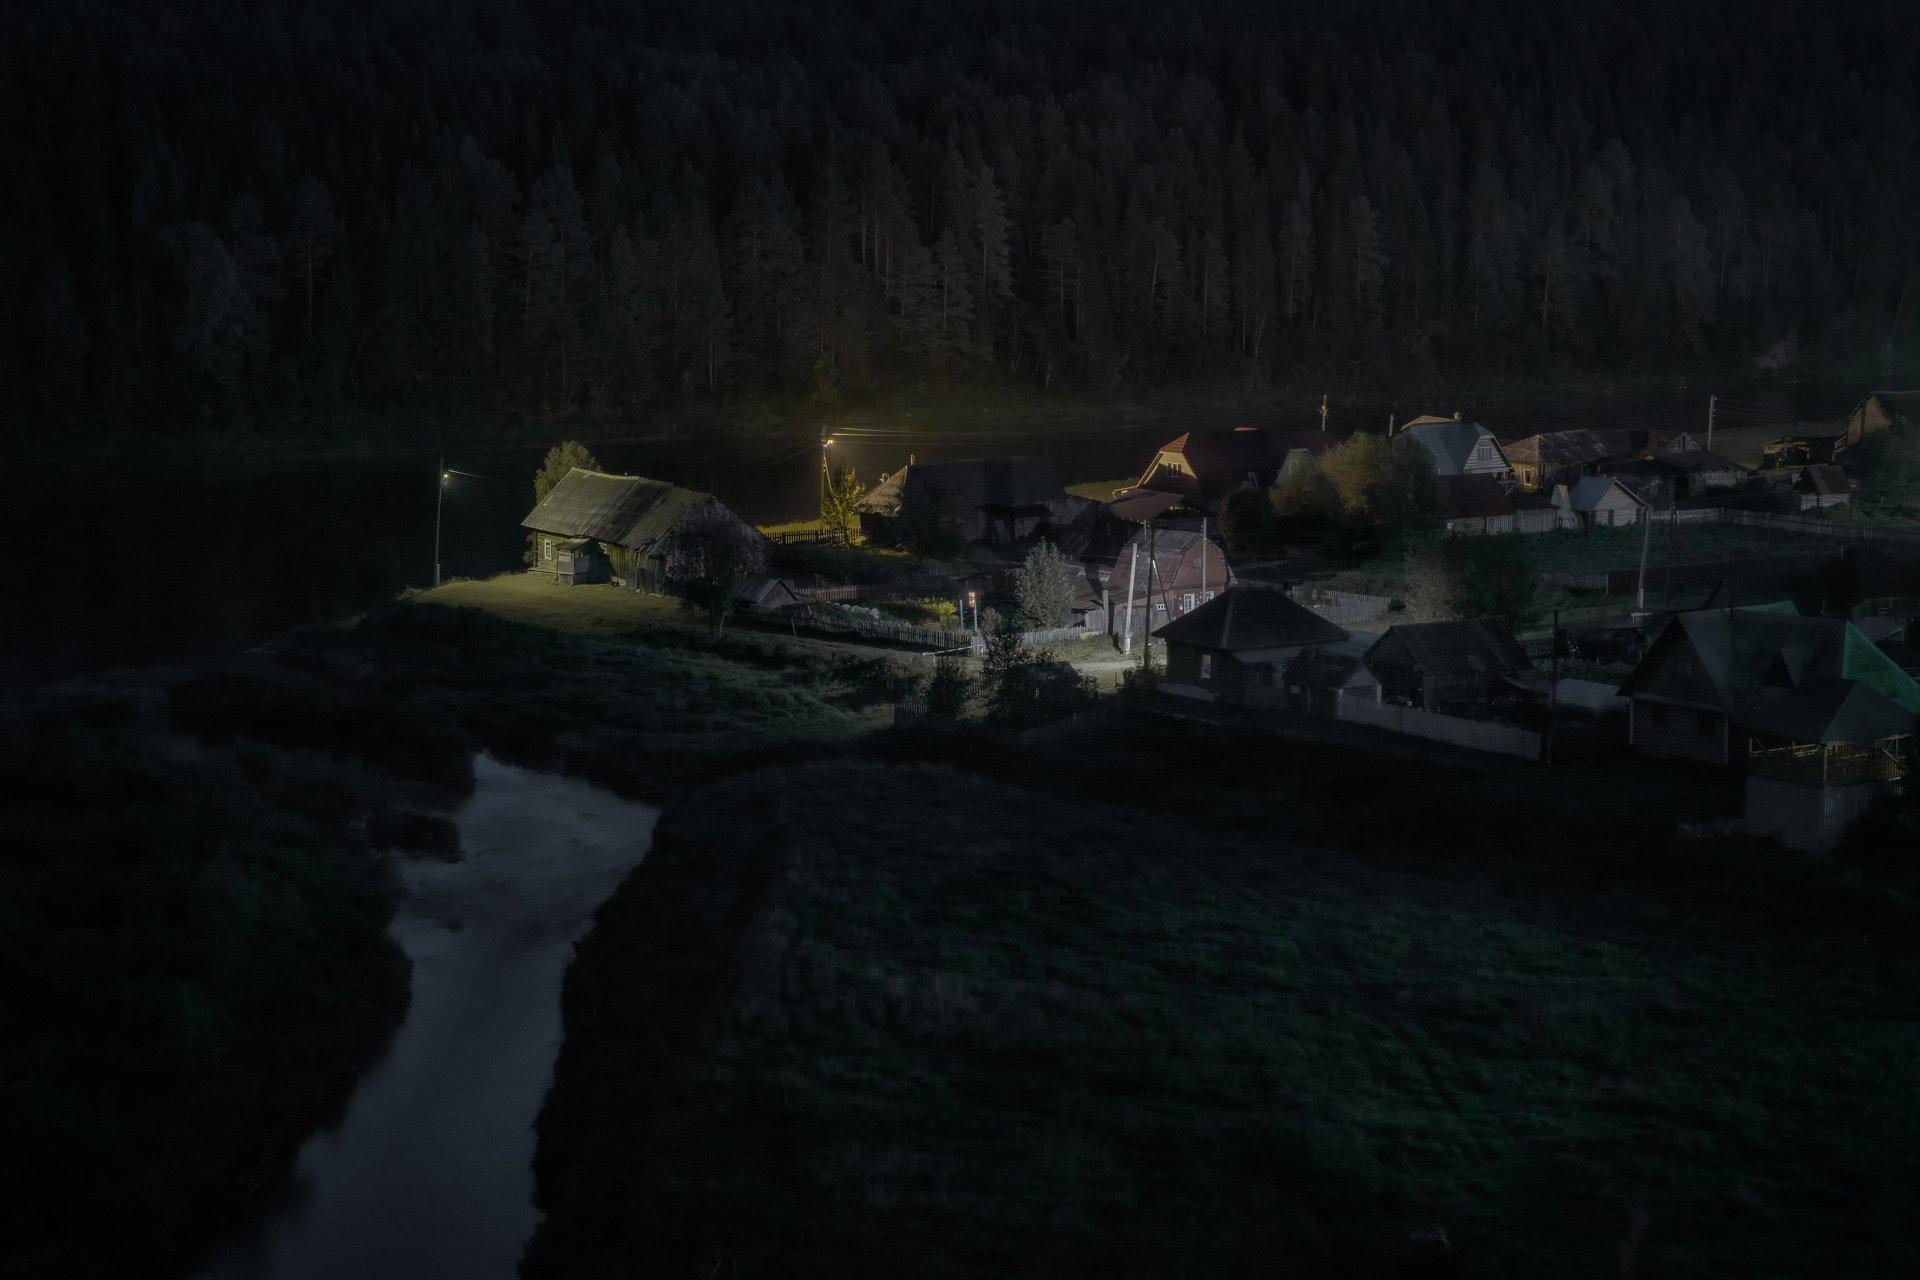 чусовая, река, ночь, кын, село, огни, лес, дома, деревня, Андрей Чиж